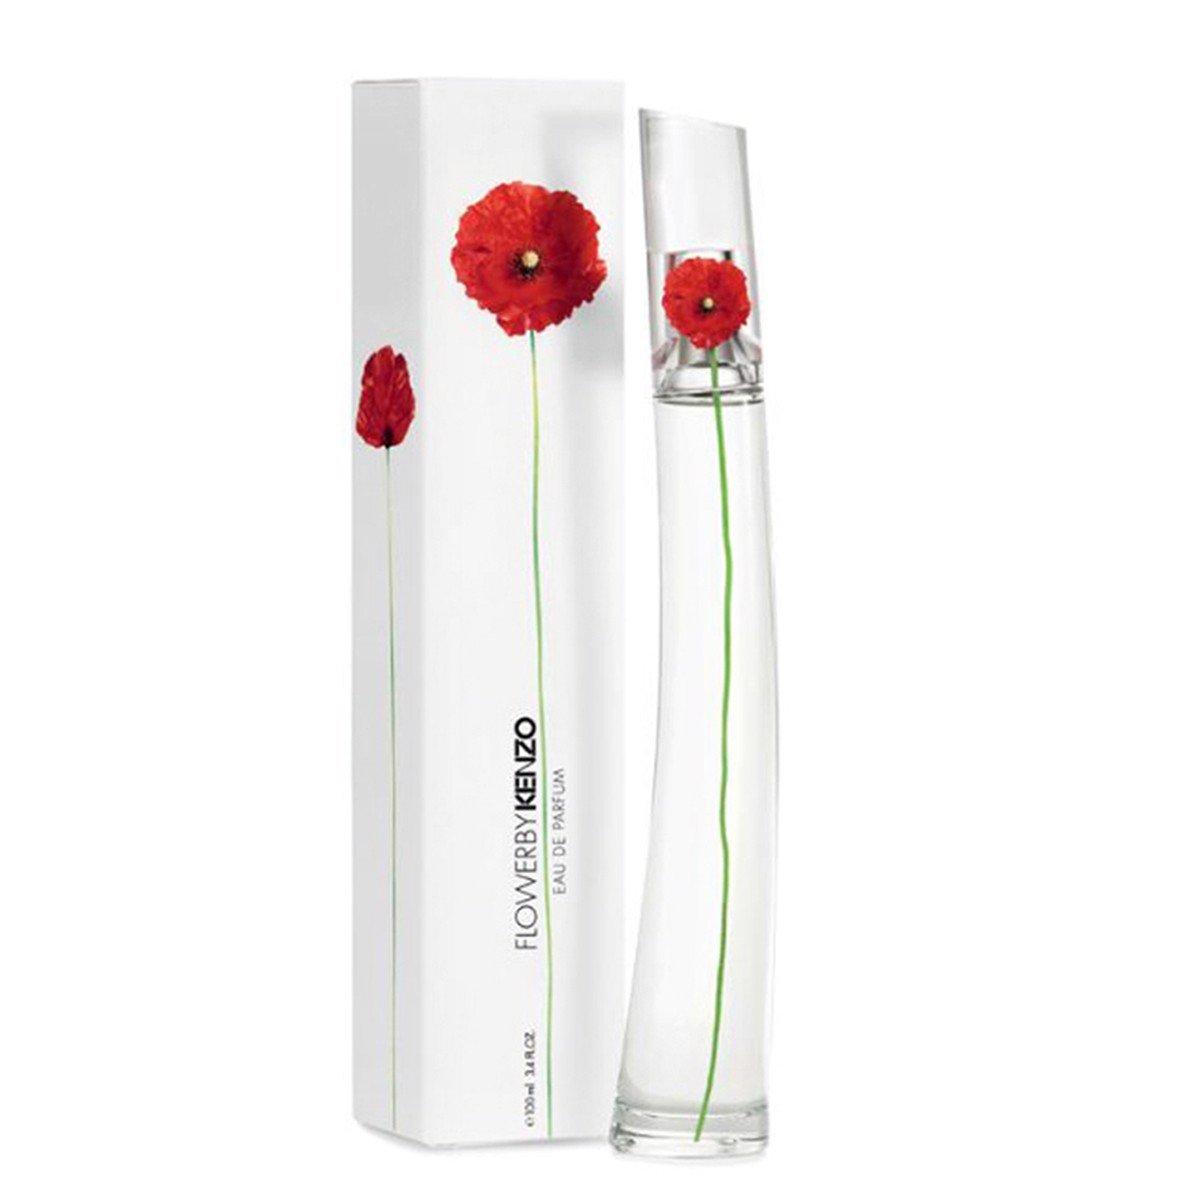 Nước hoa nữ Flower by Kenzo | namperfume – Nam Perfume